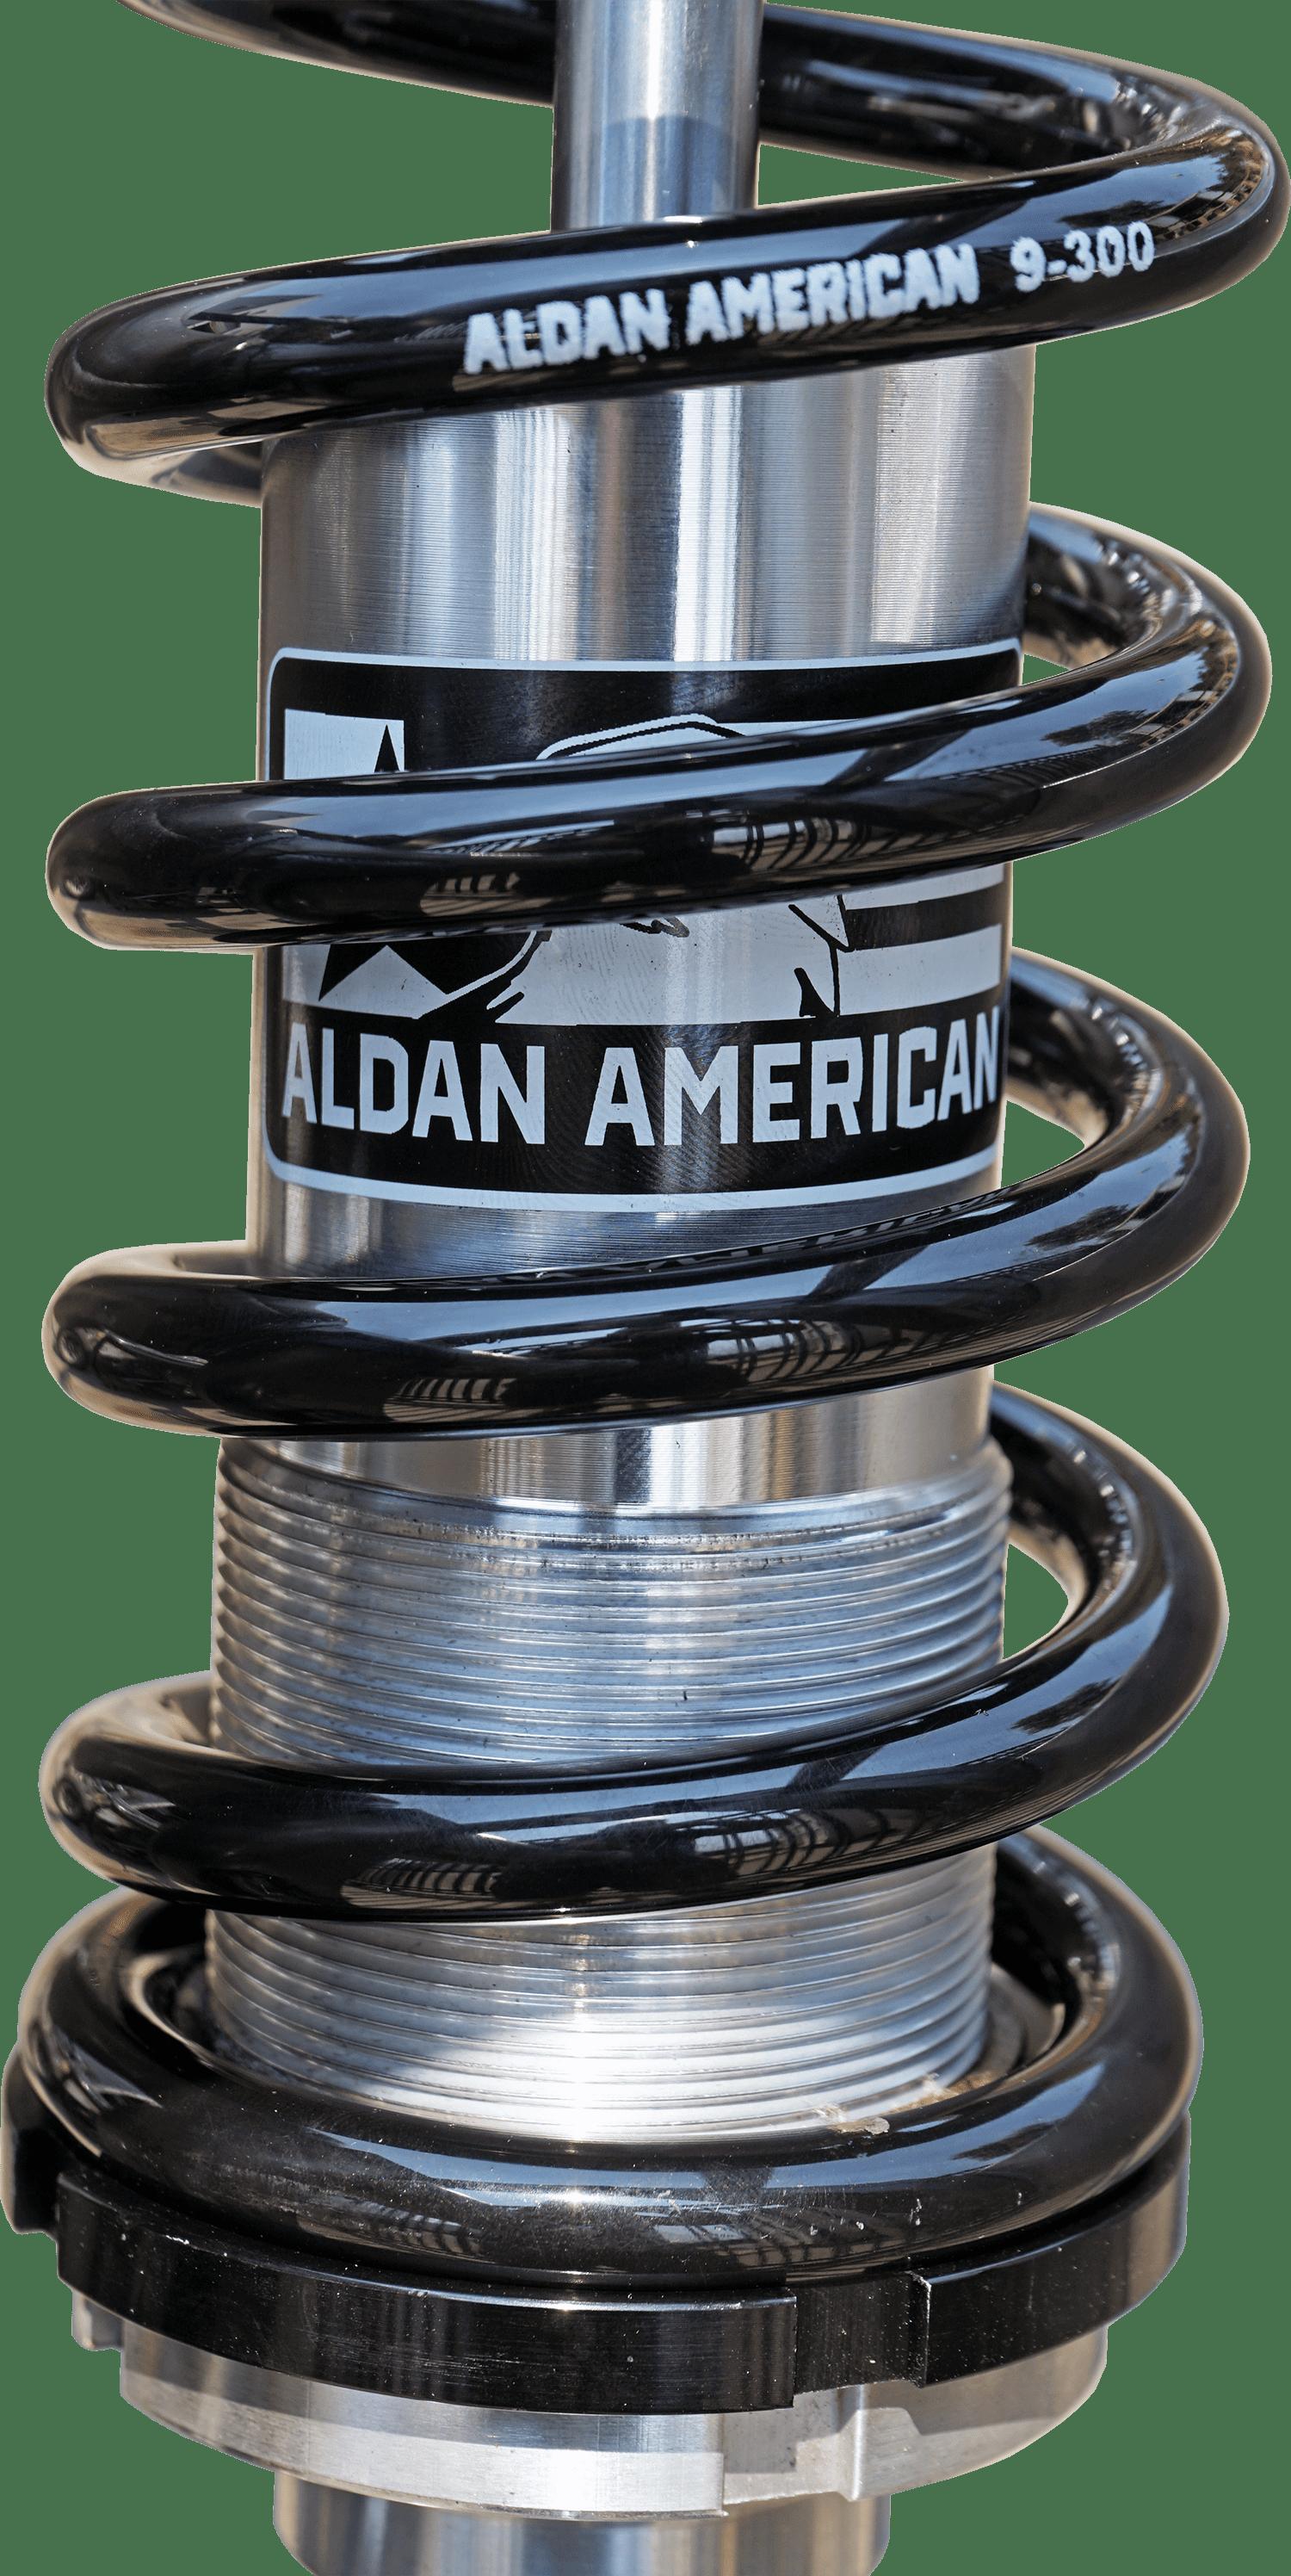 ALDAN AMERICAN COILOVER